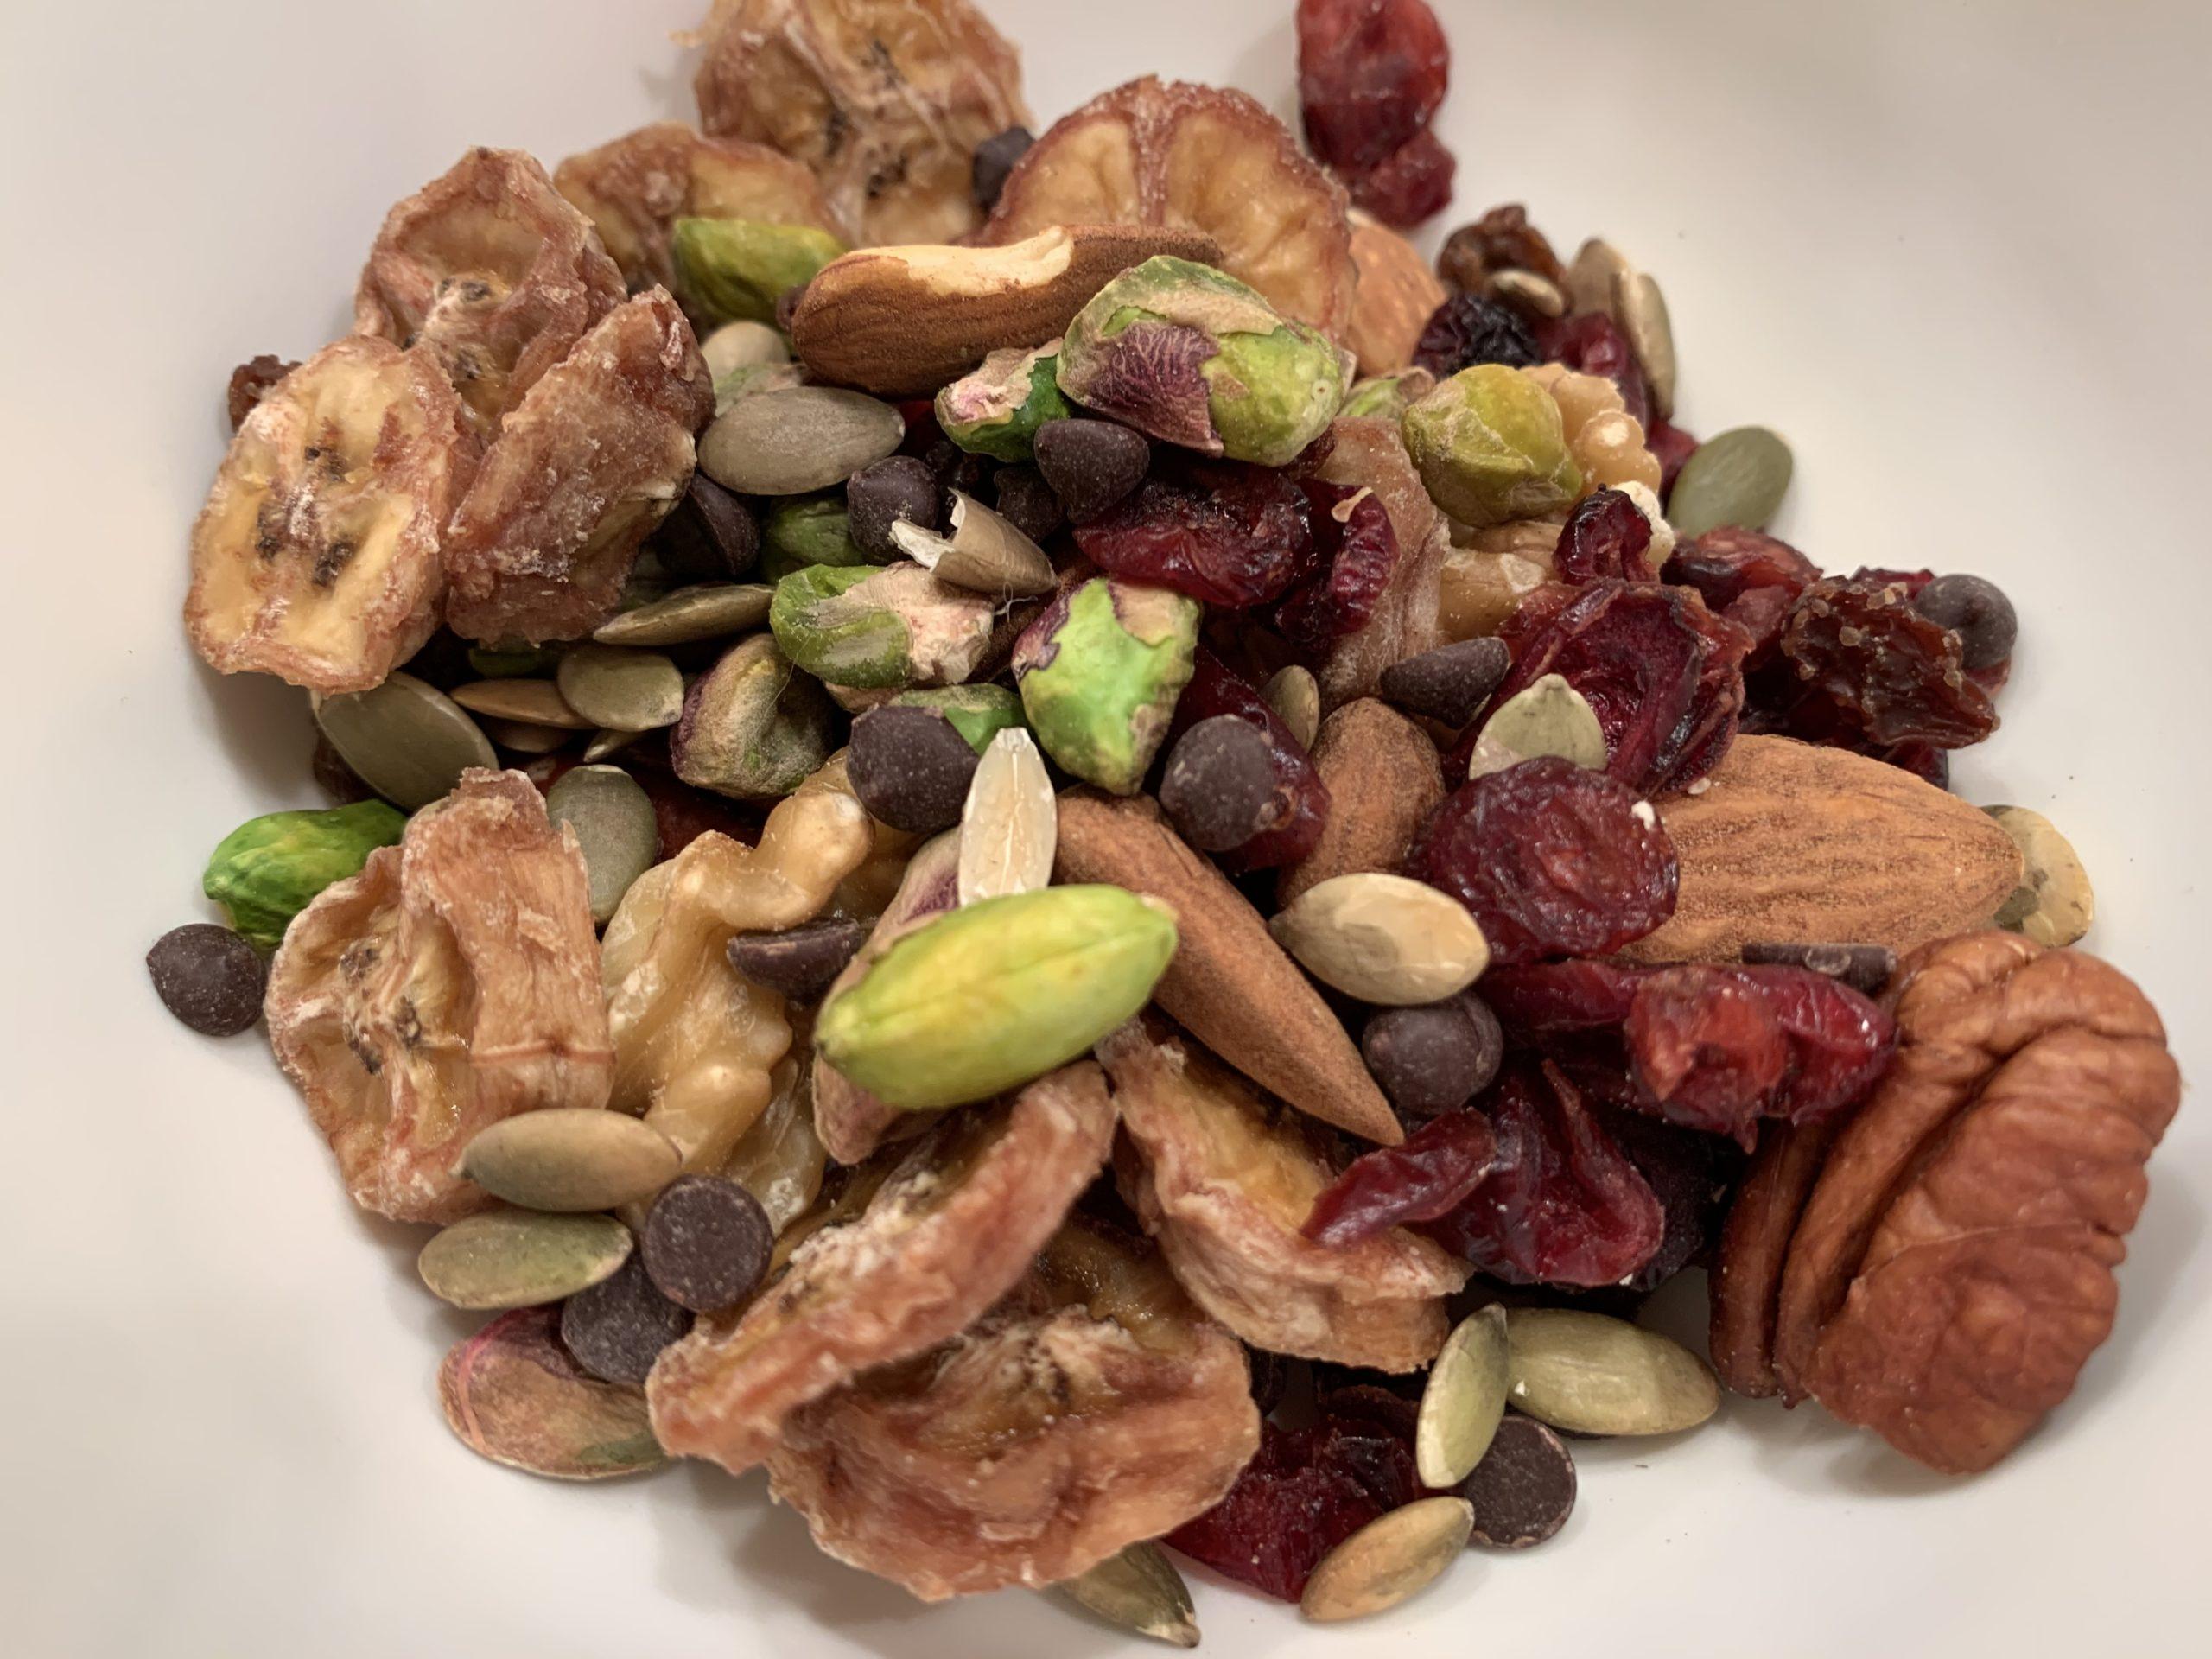 Easy and Tasty Antioxidant Trail Mix Recipe IMG_0647